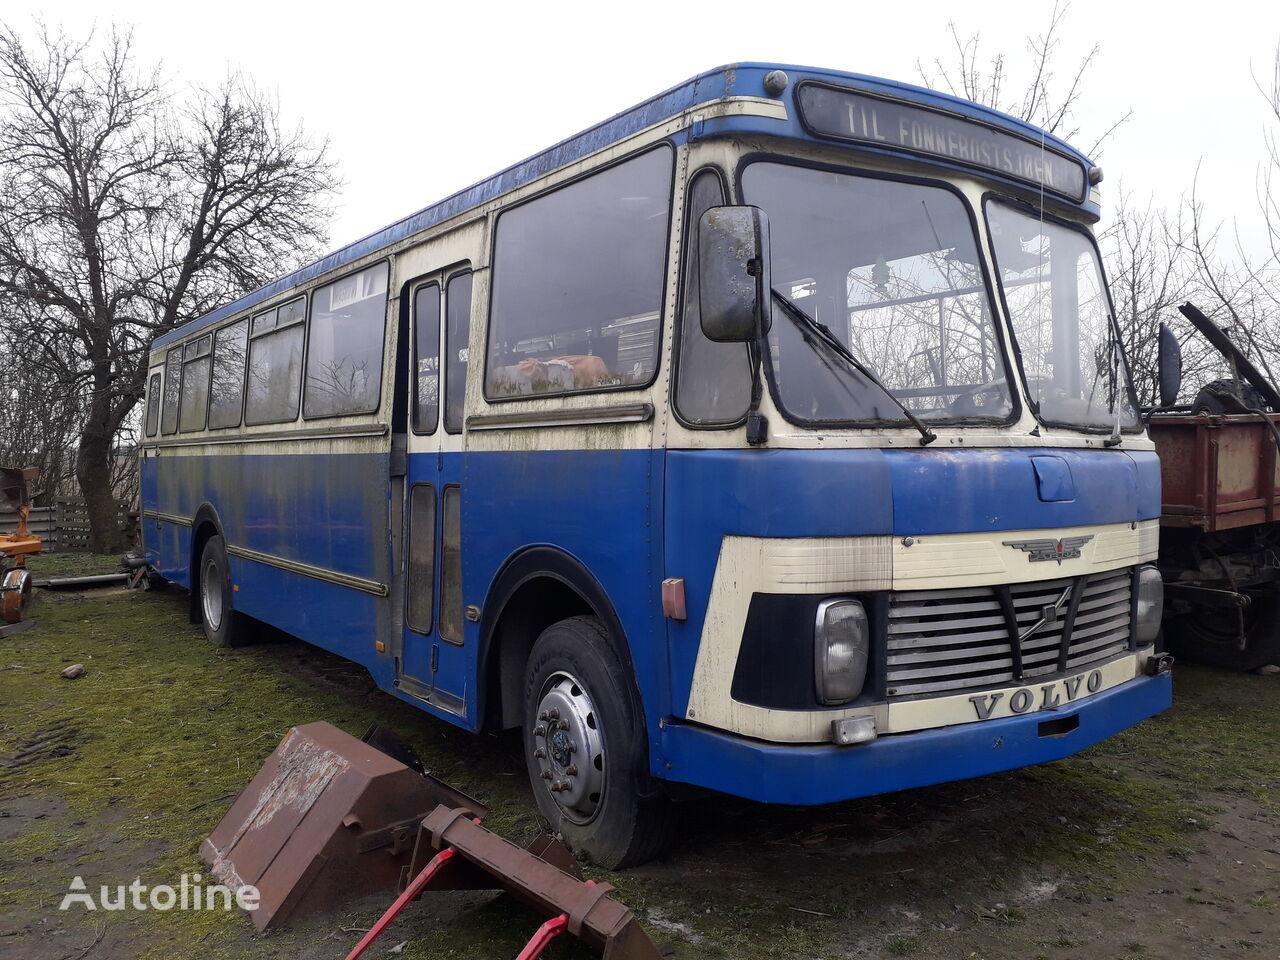 VOLVO ARNA interurban bus